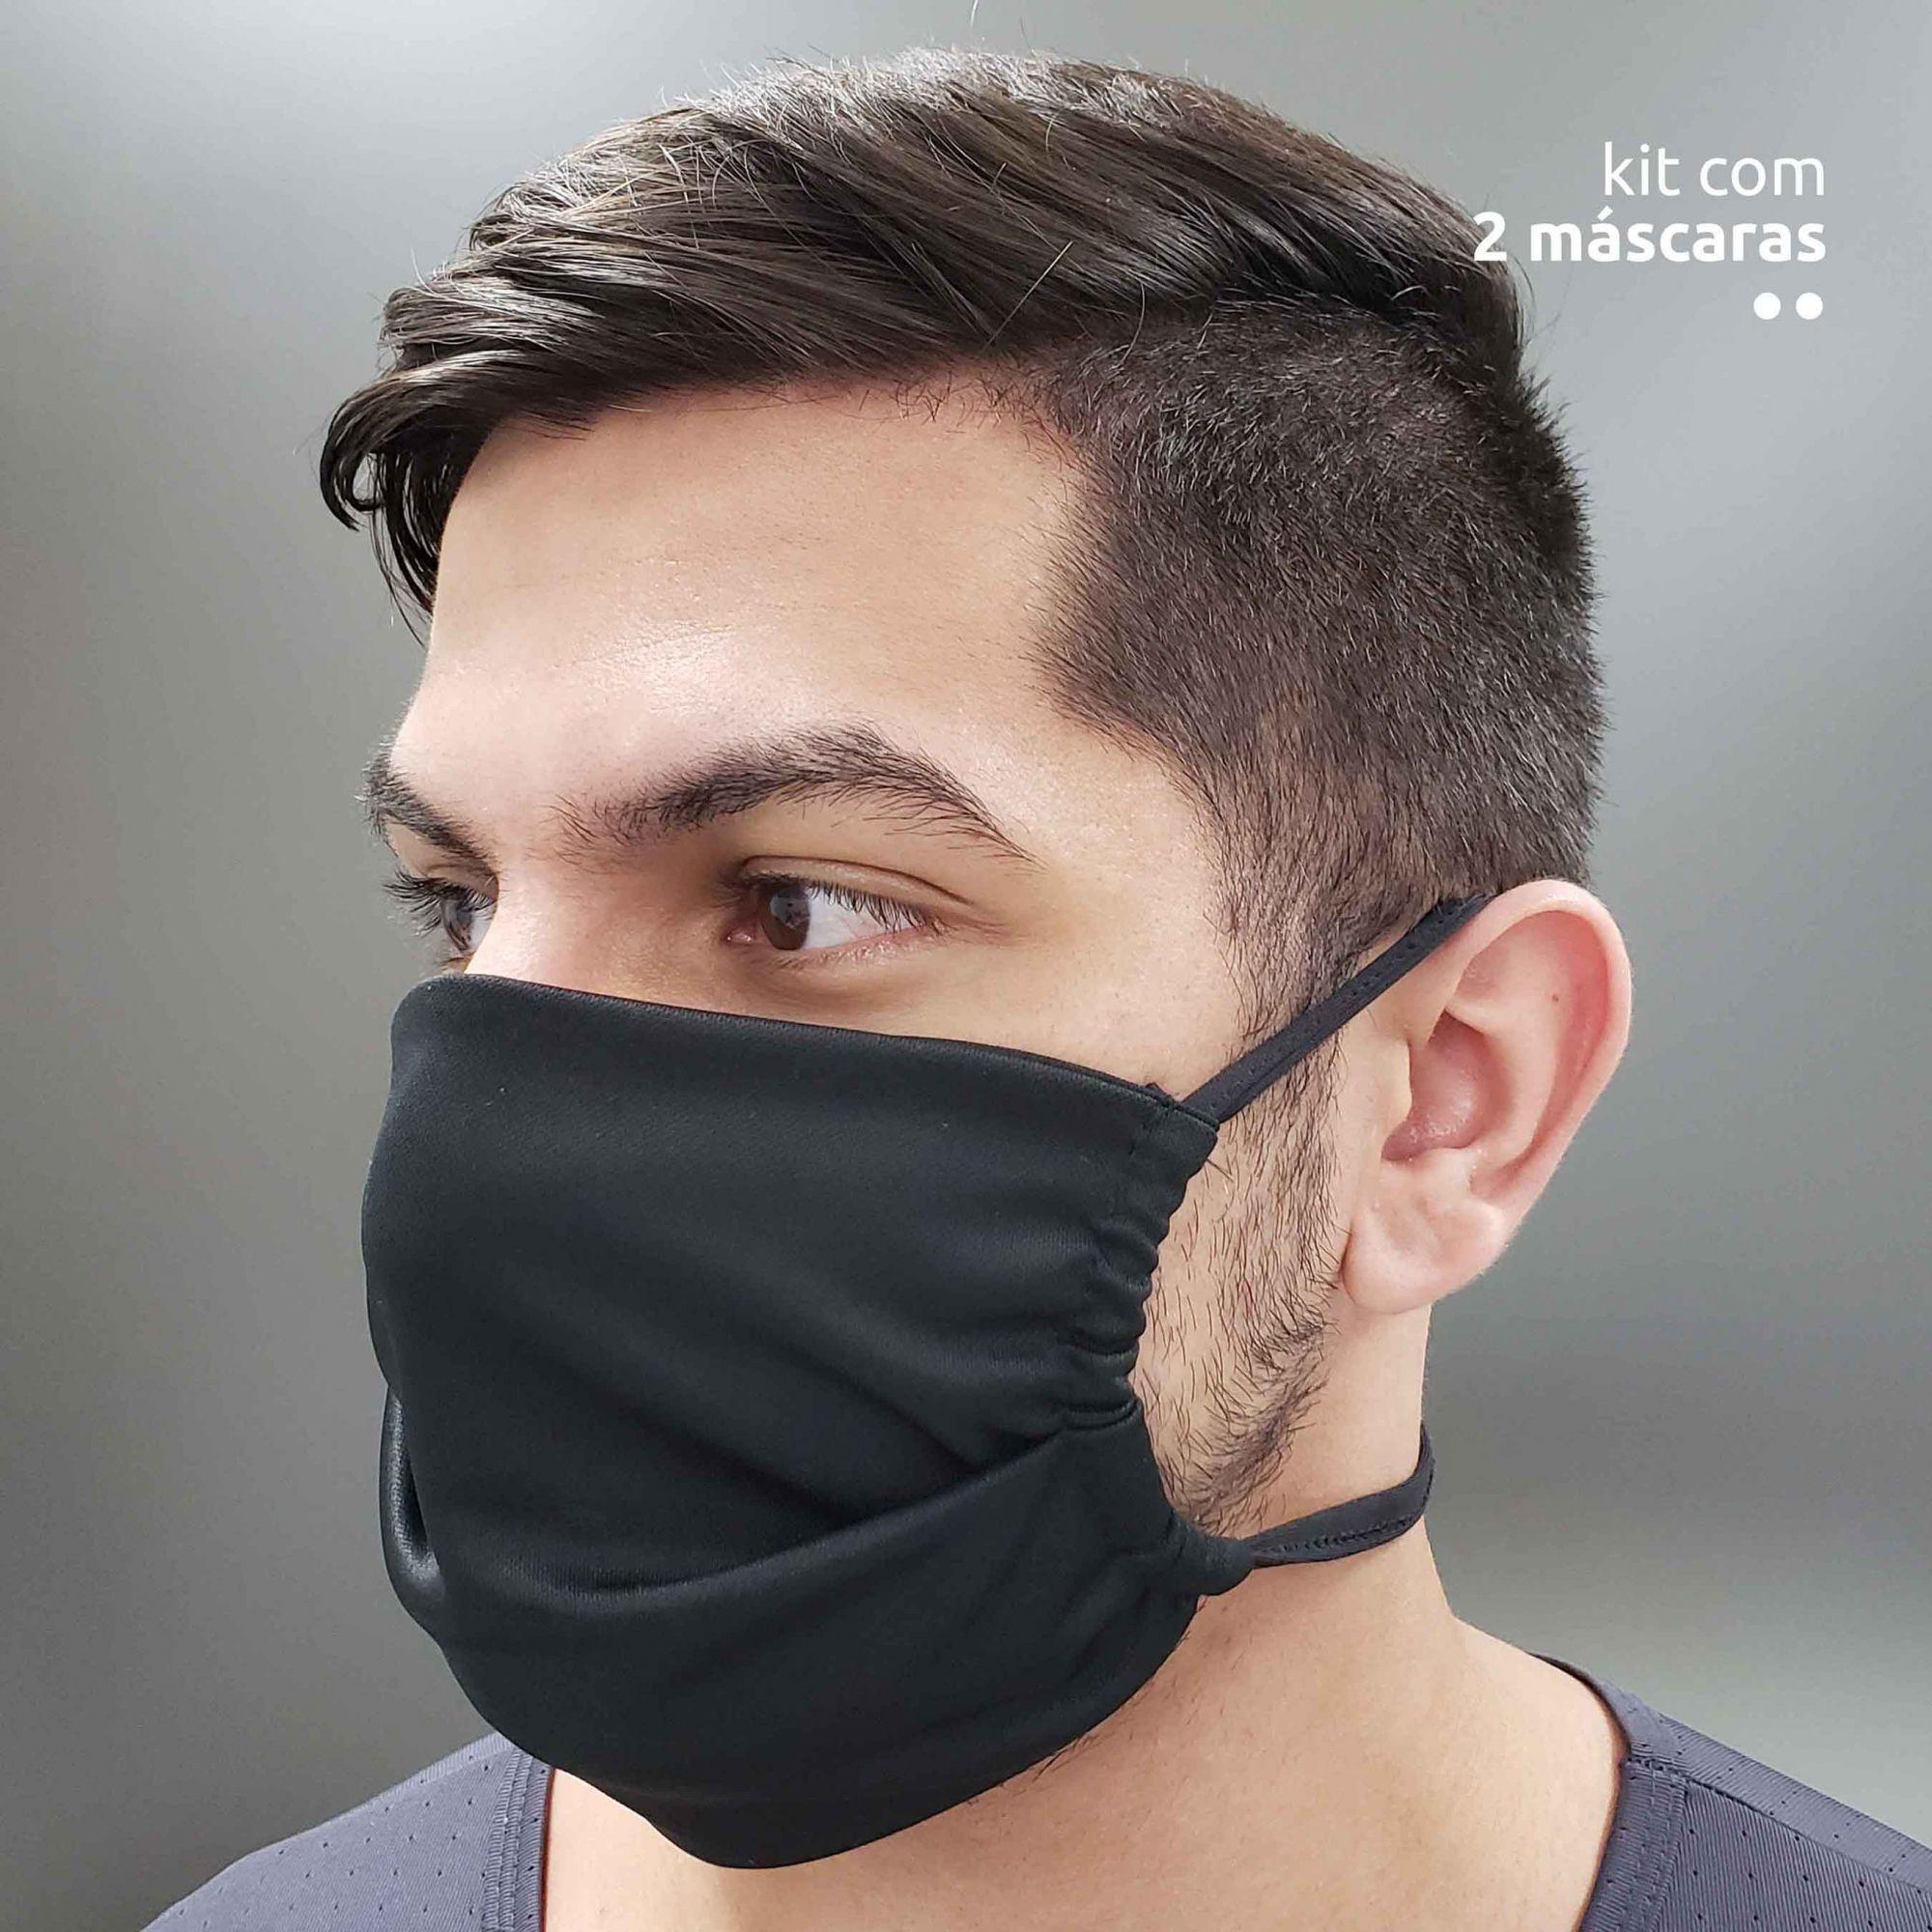 Kit com 2 máscaras antivirais - Preta